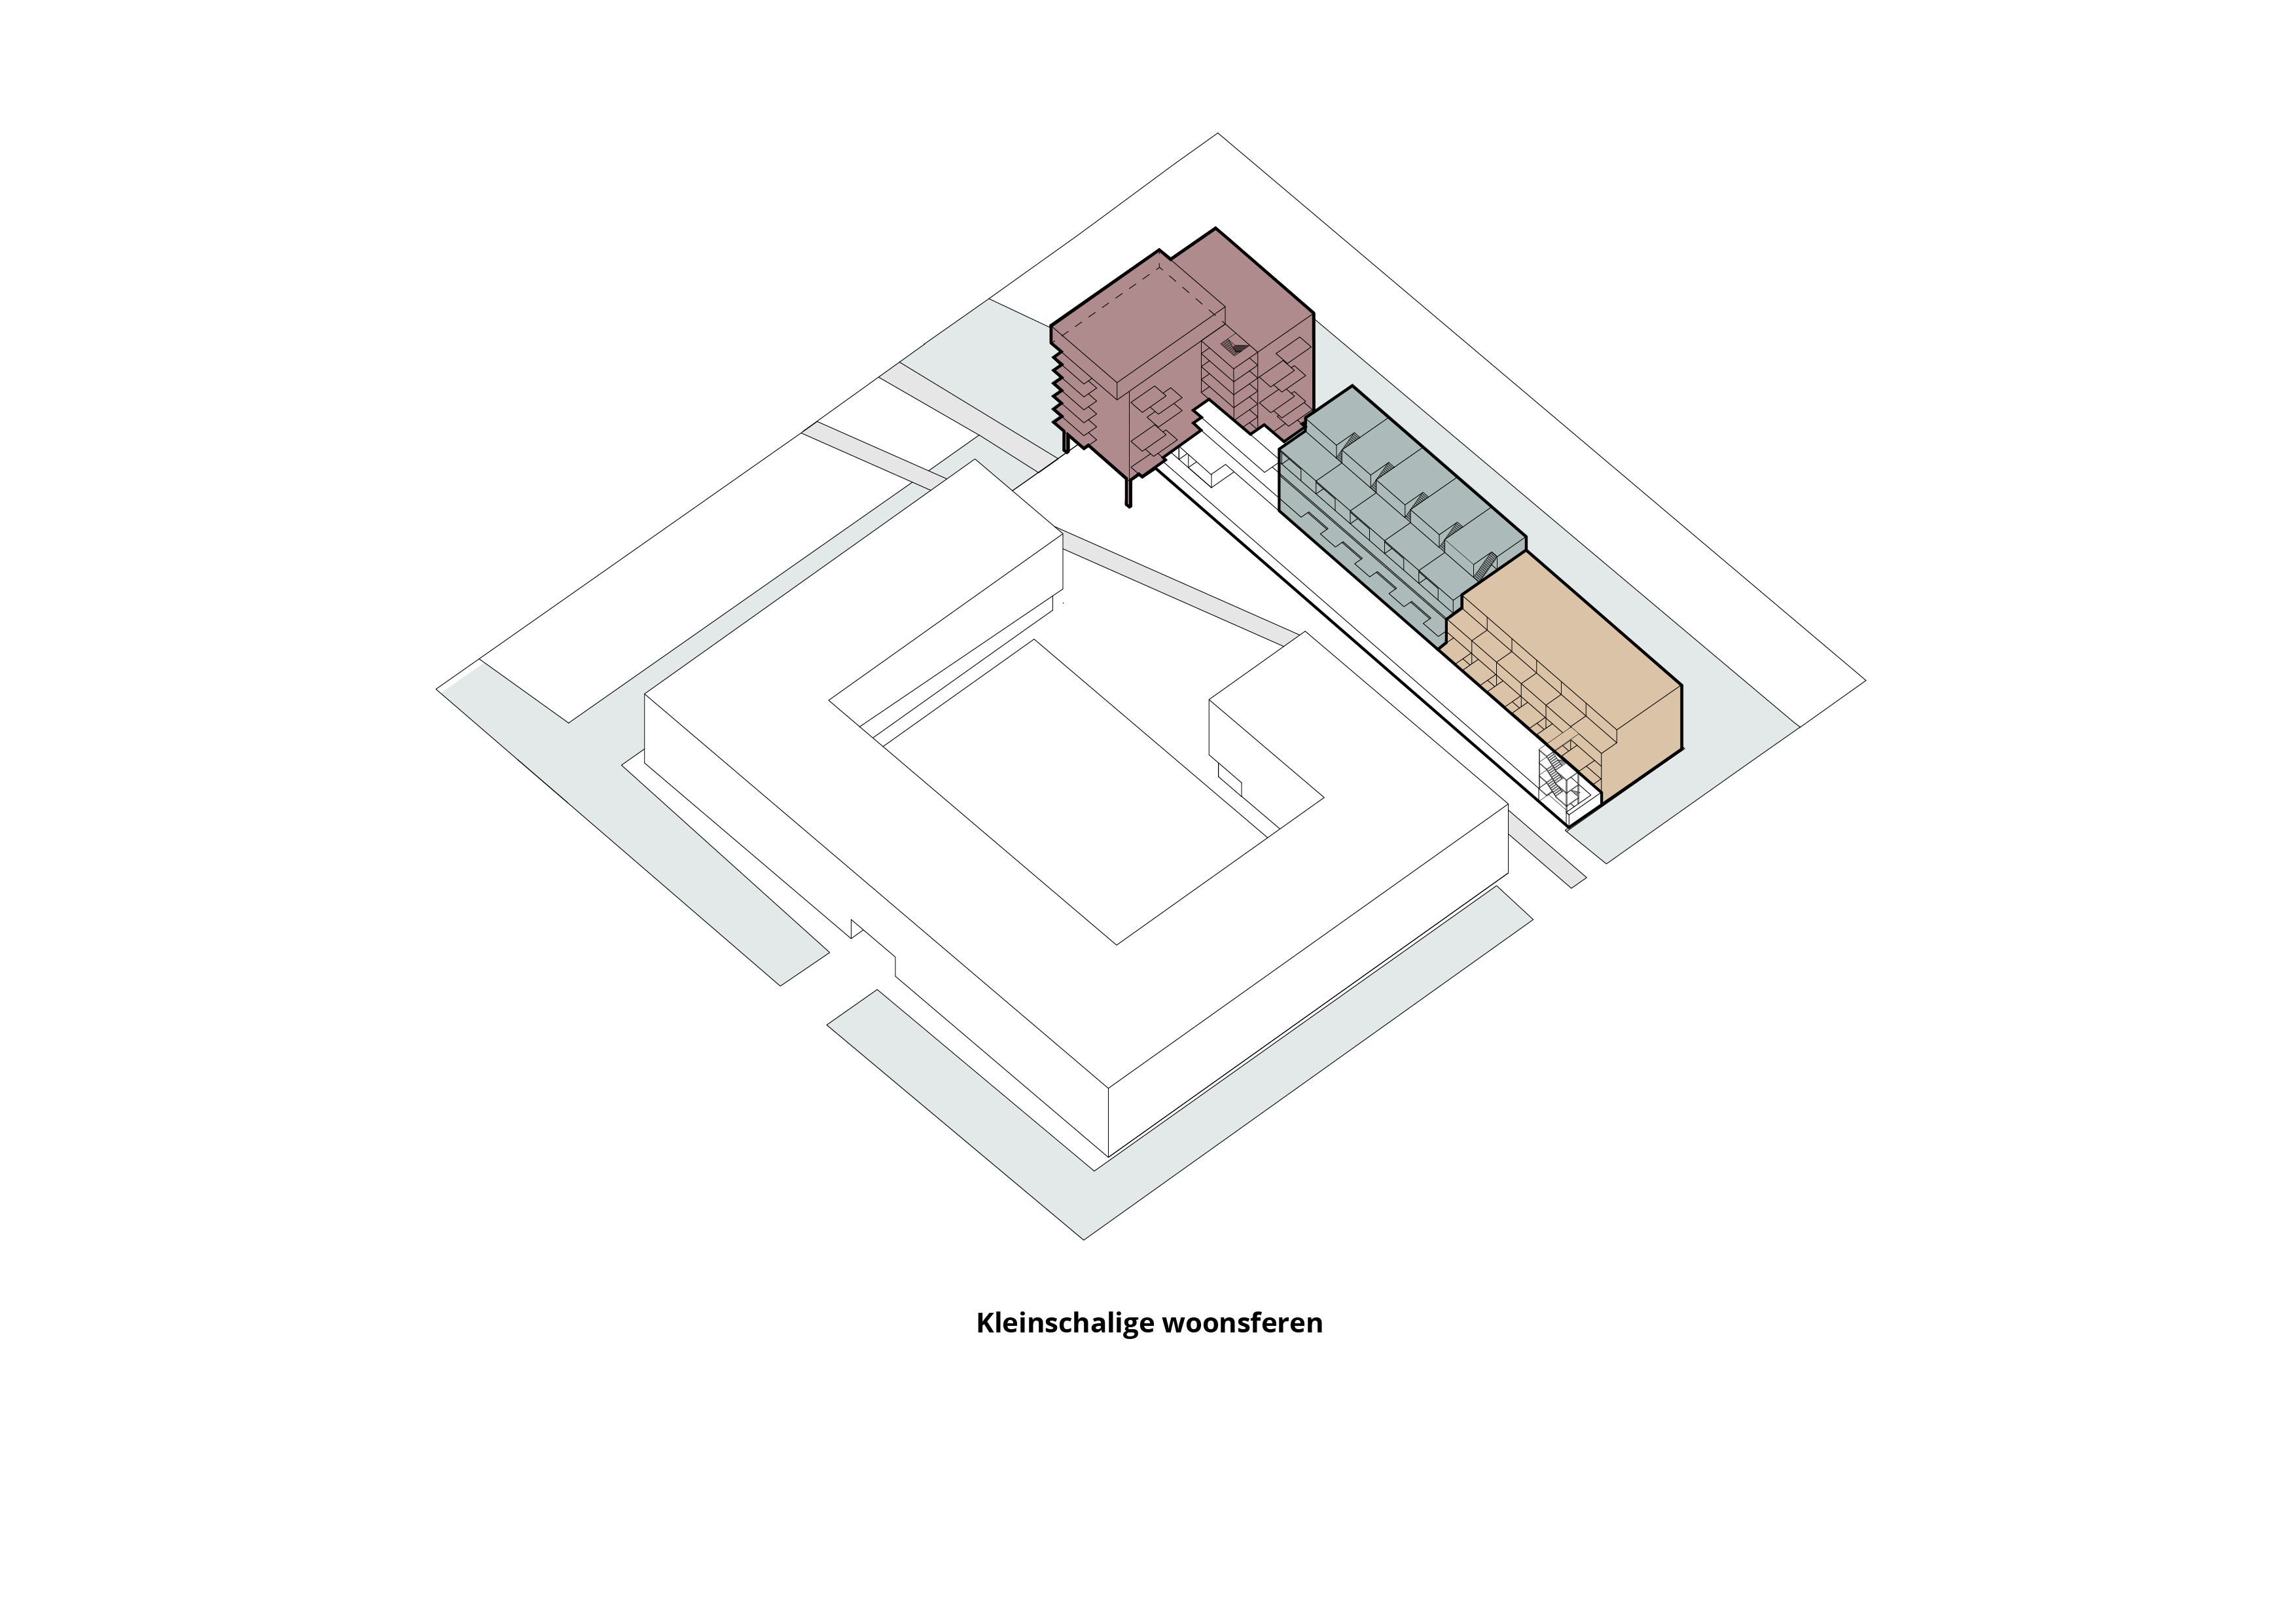 The Family Spoorzone Delft – Kleinschalige woonsferen